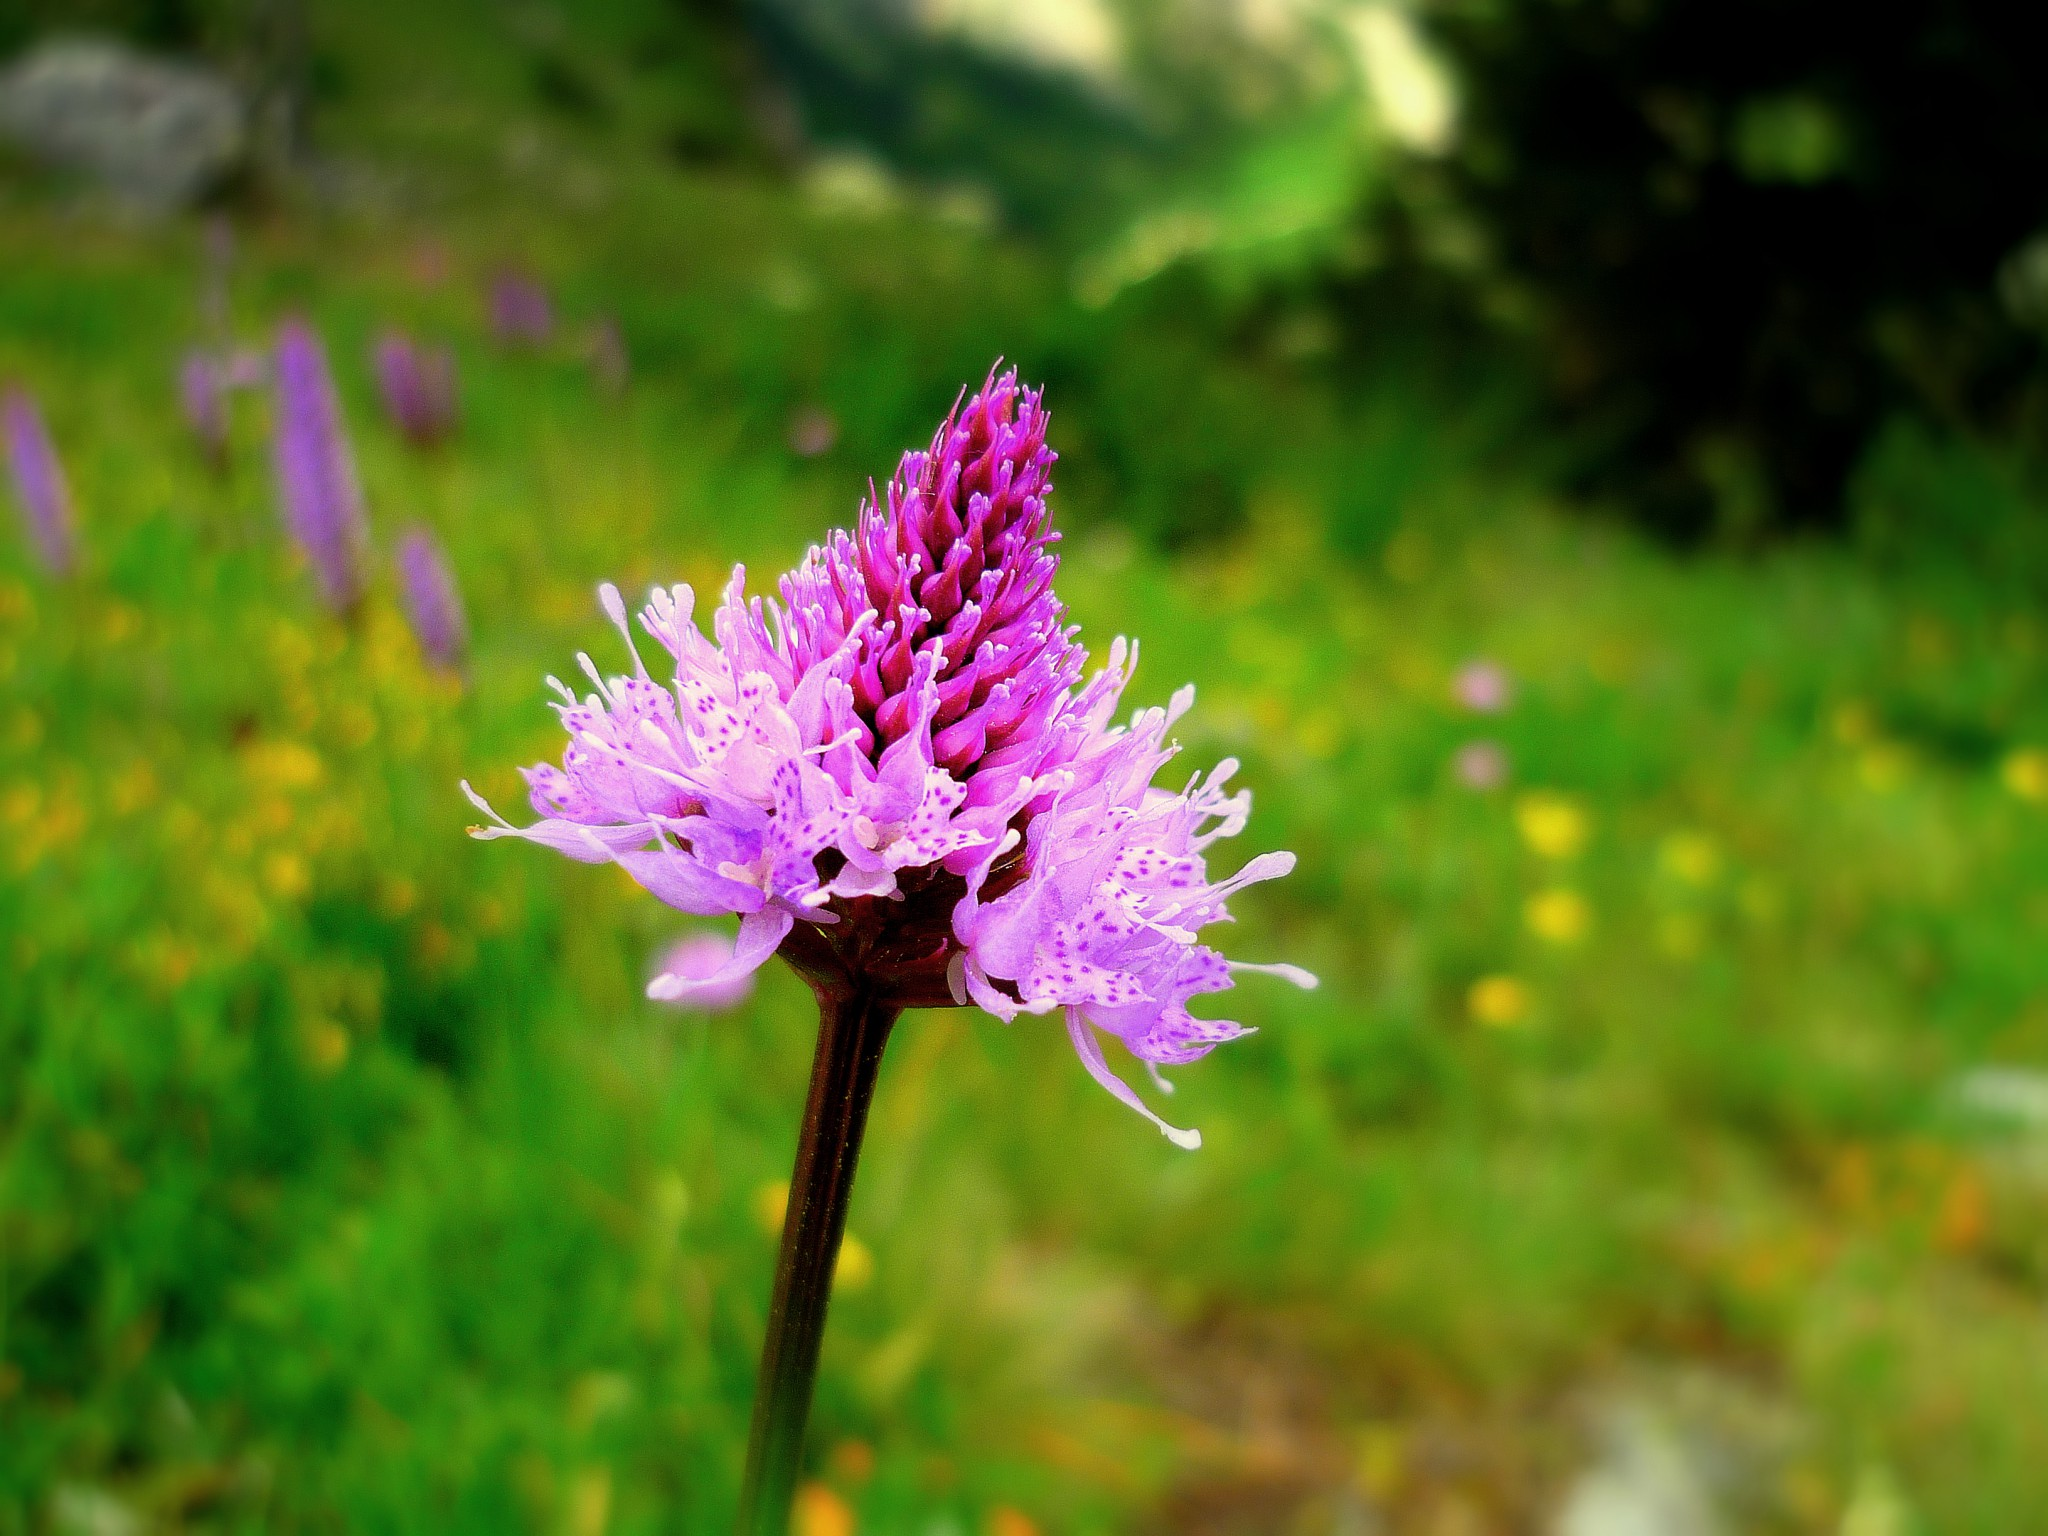 Flora of the French Alps in Vanoise - Fleurs de la Vanoise - French Moments